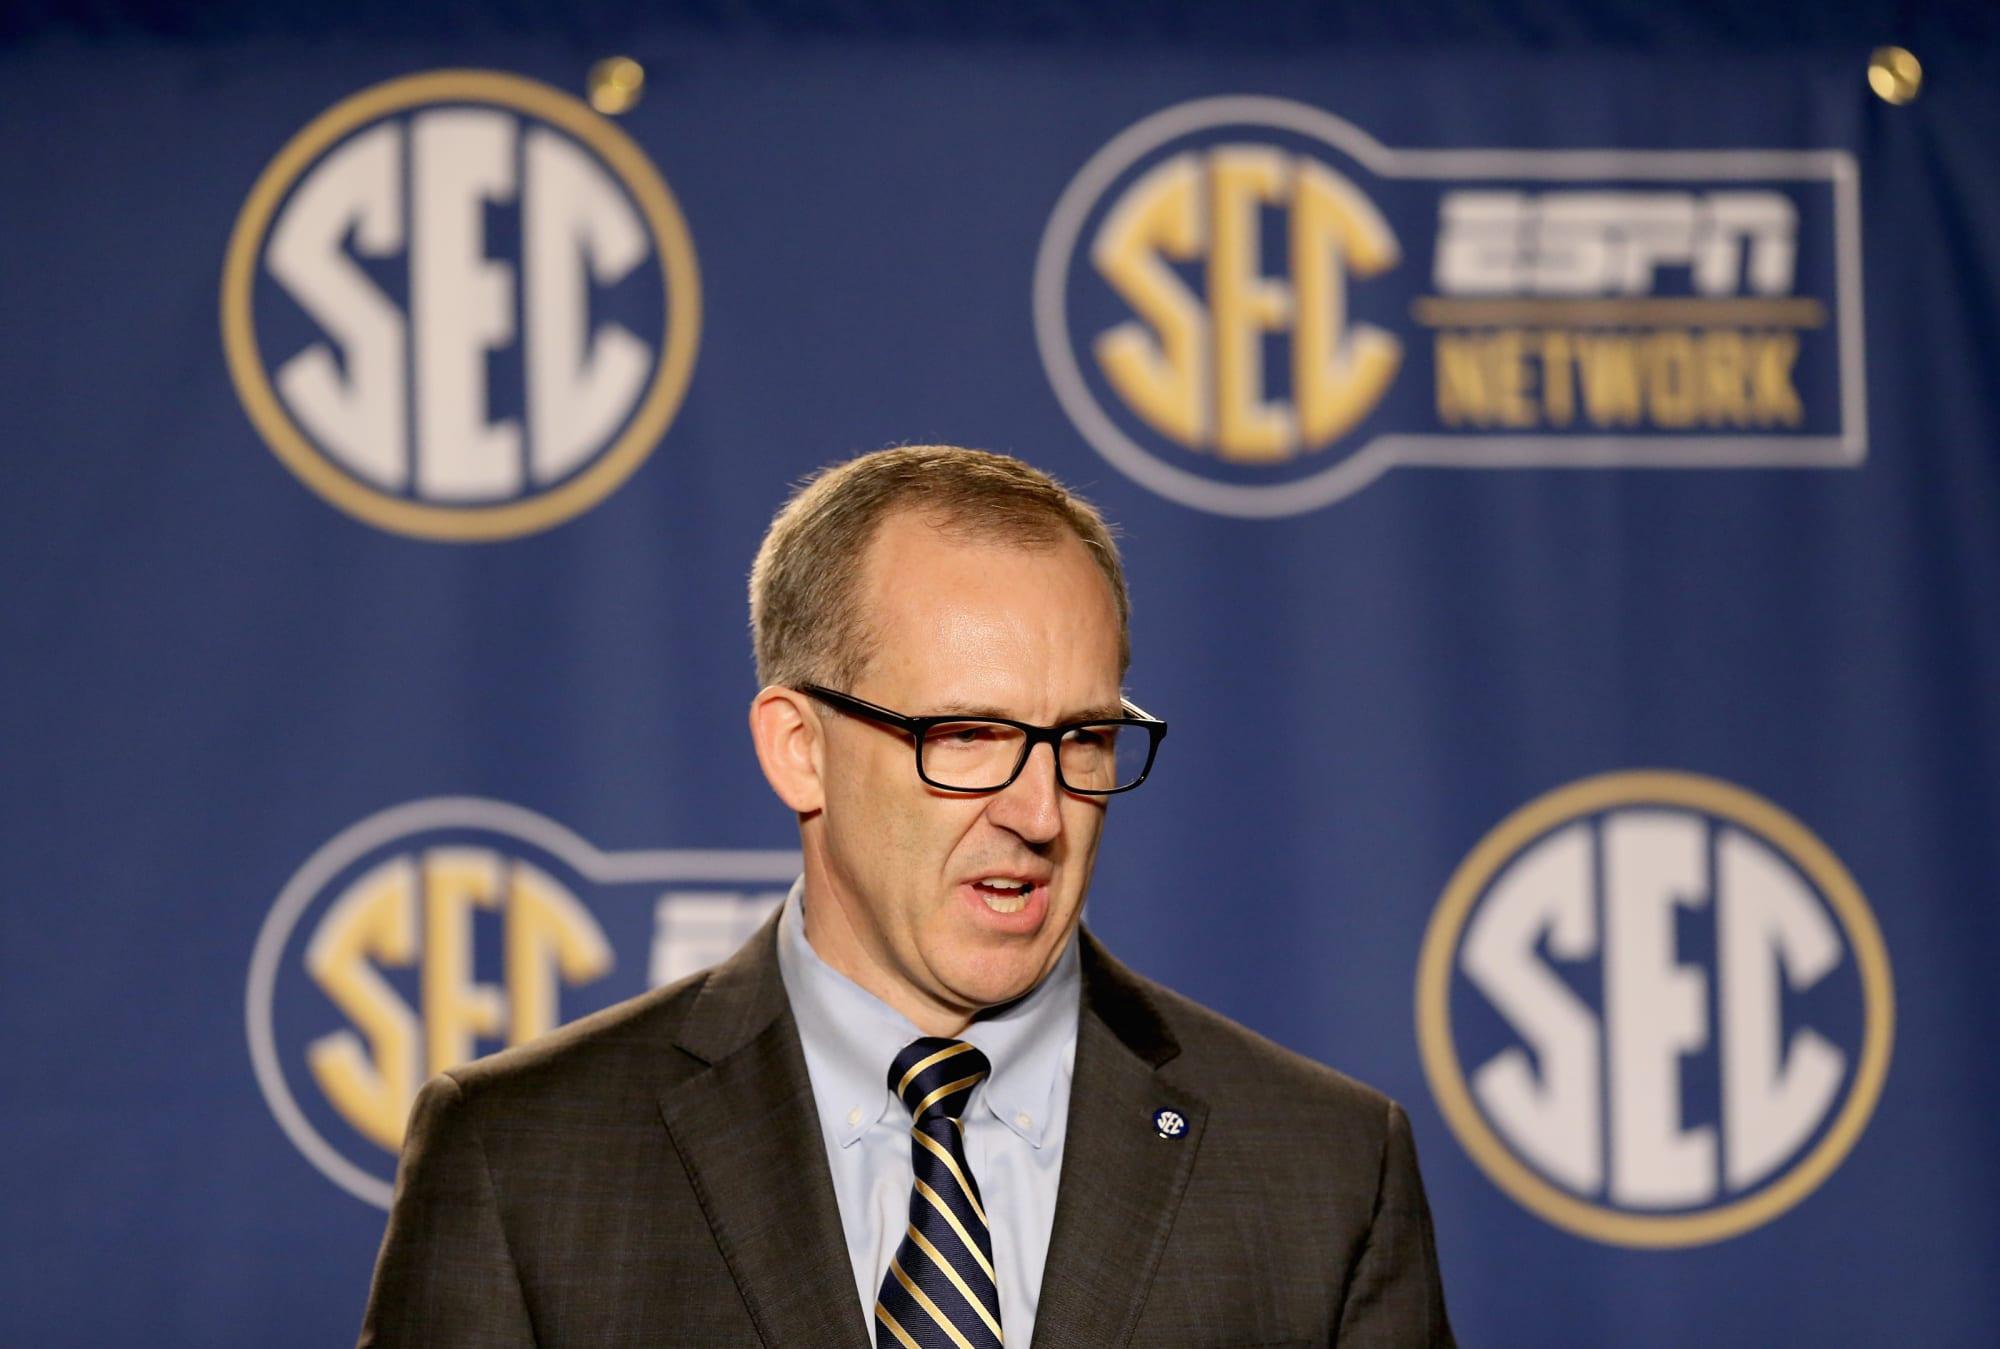 Alabama Football: SEC Athletic Directors meet Monday to discuss options